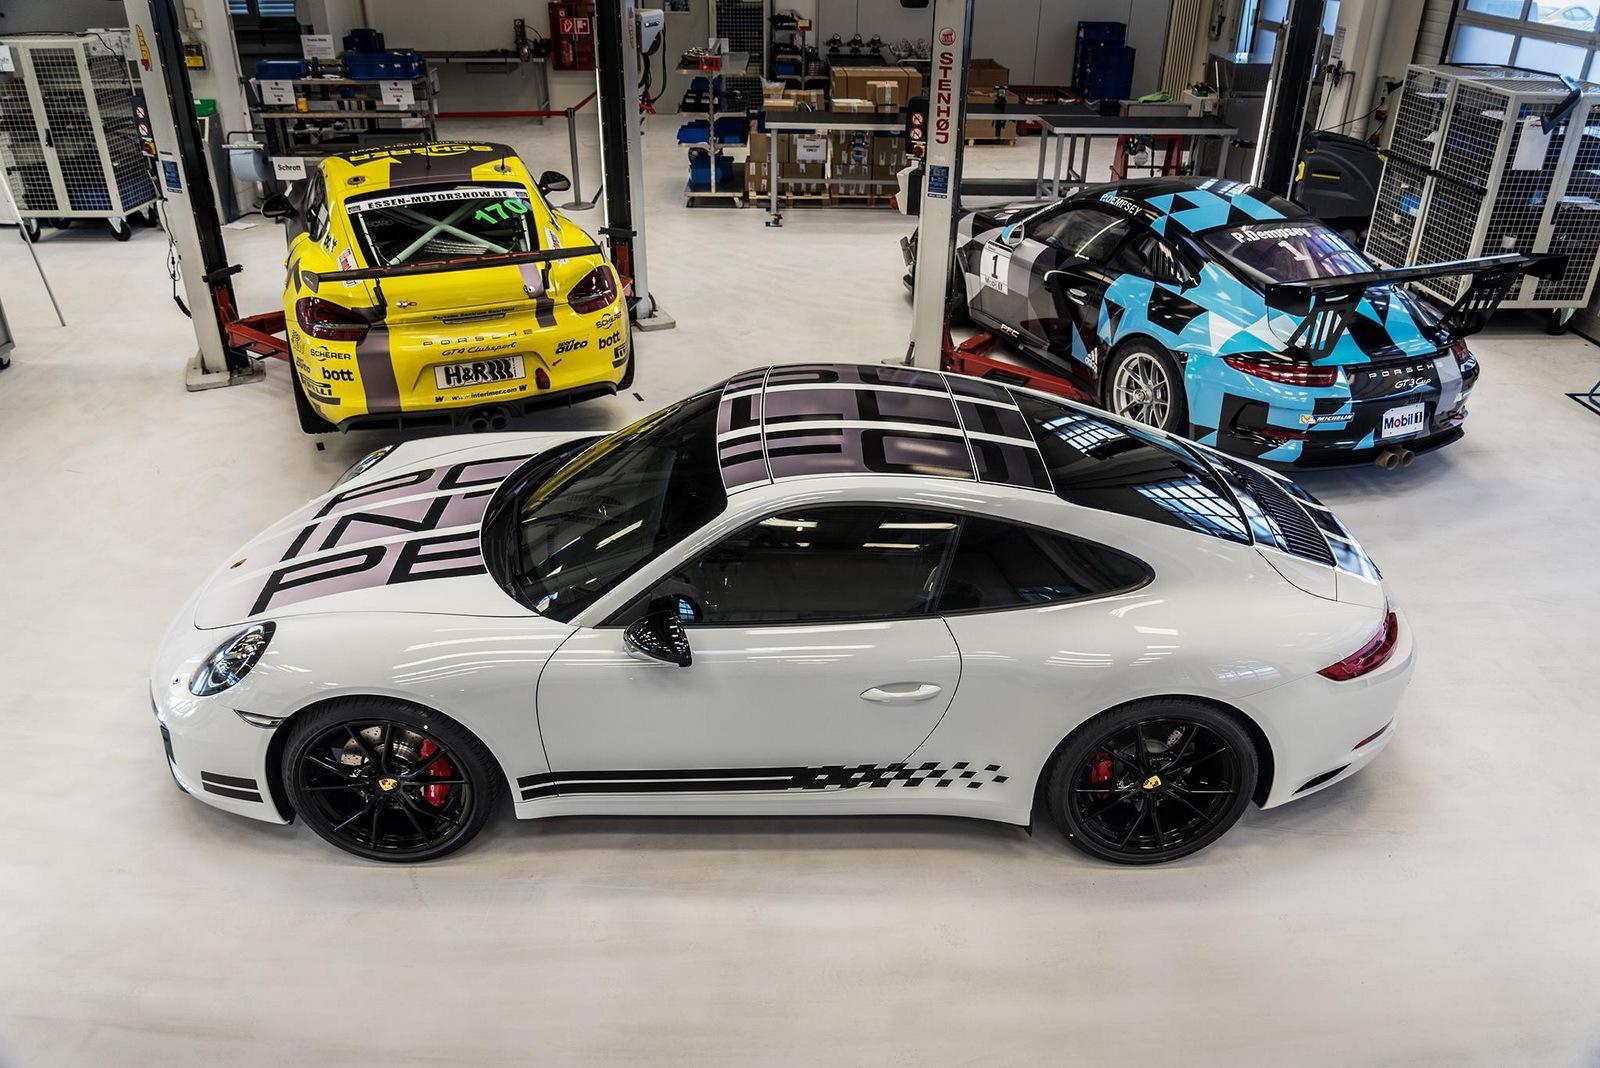 Foto de Porsche 911 Carrera S Endurance Racing Edition (2/10)